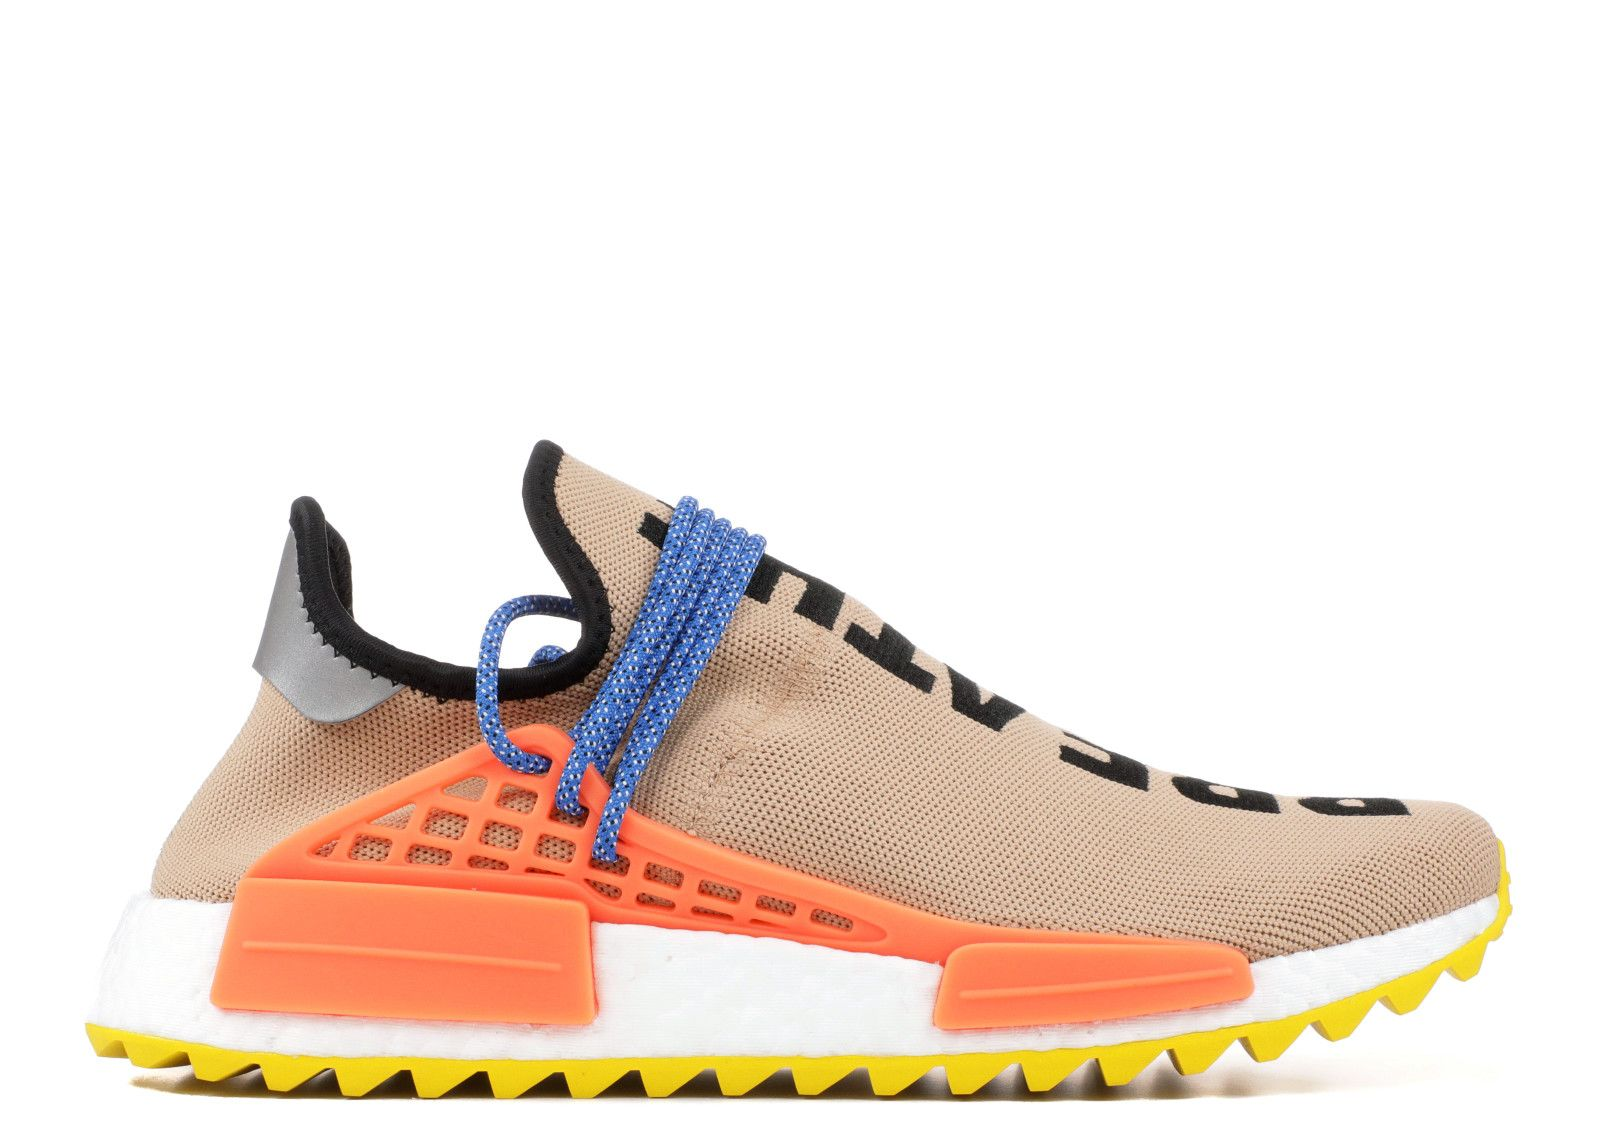 Le sneakers 2018 da avere sono le adidas PW Human Race NMD